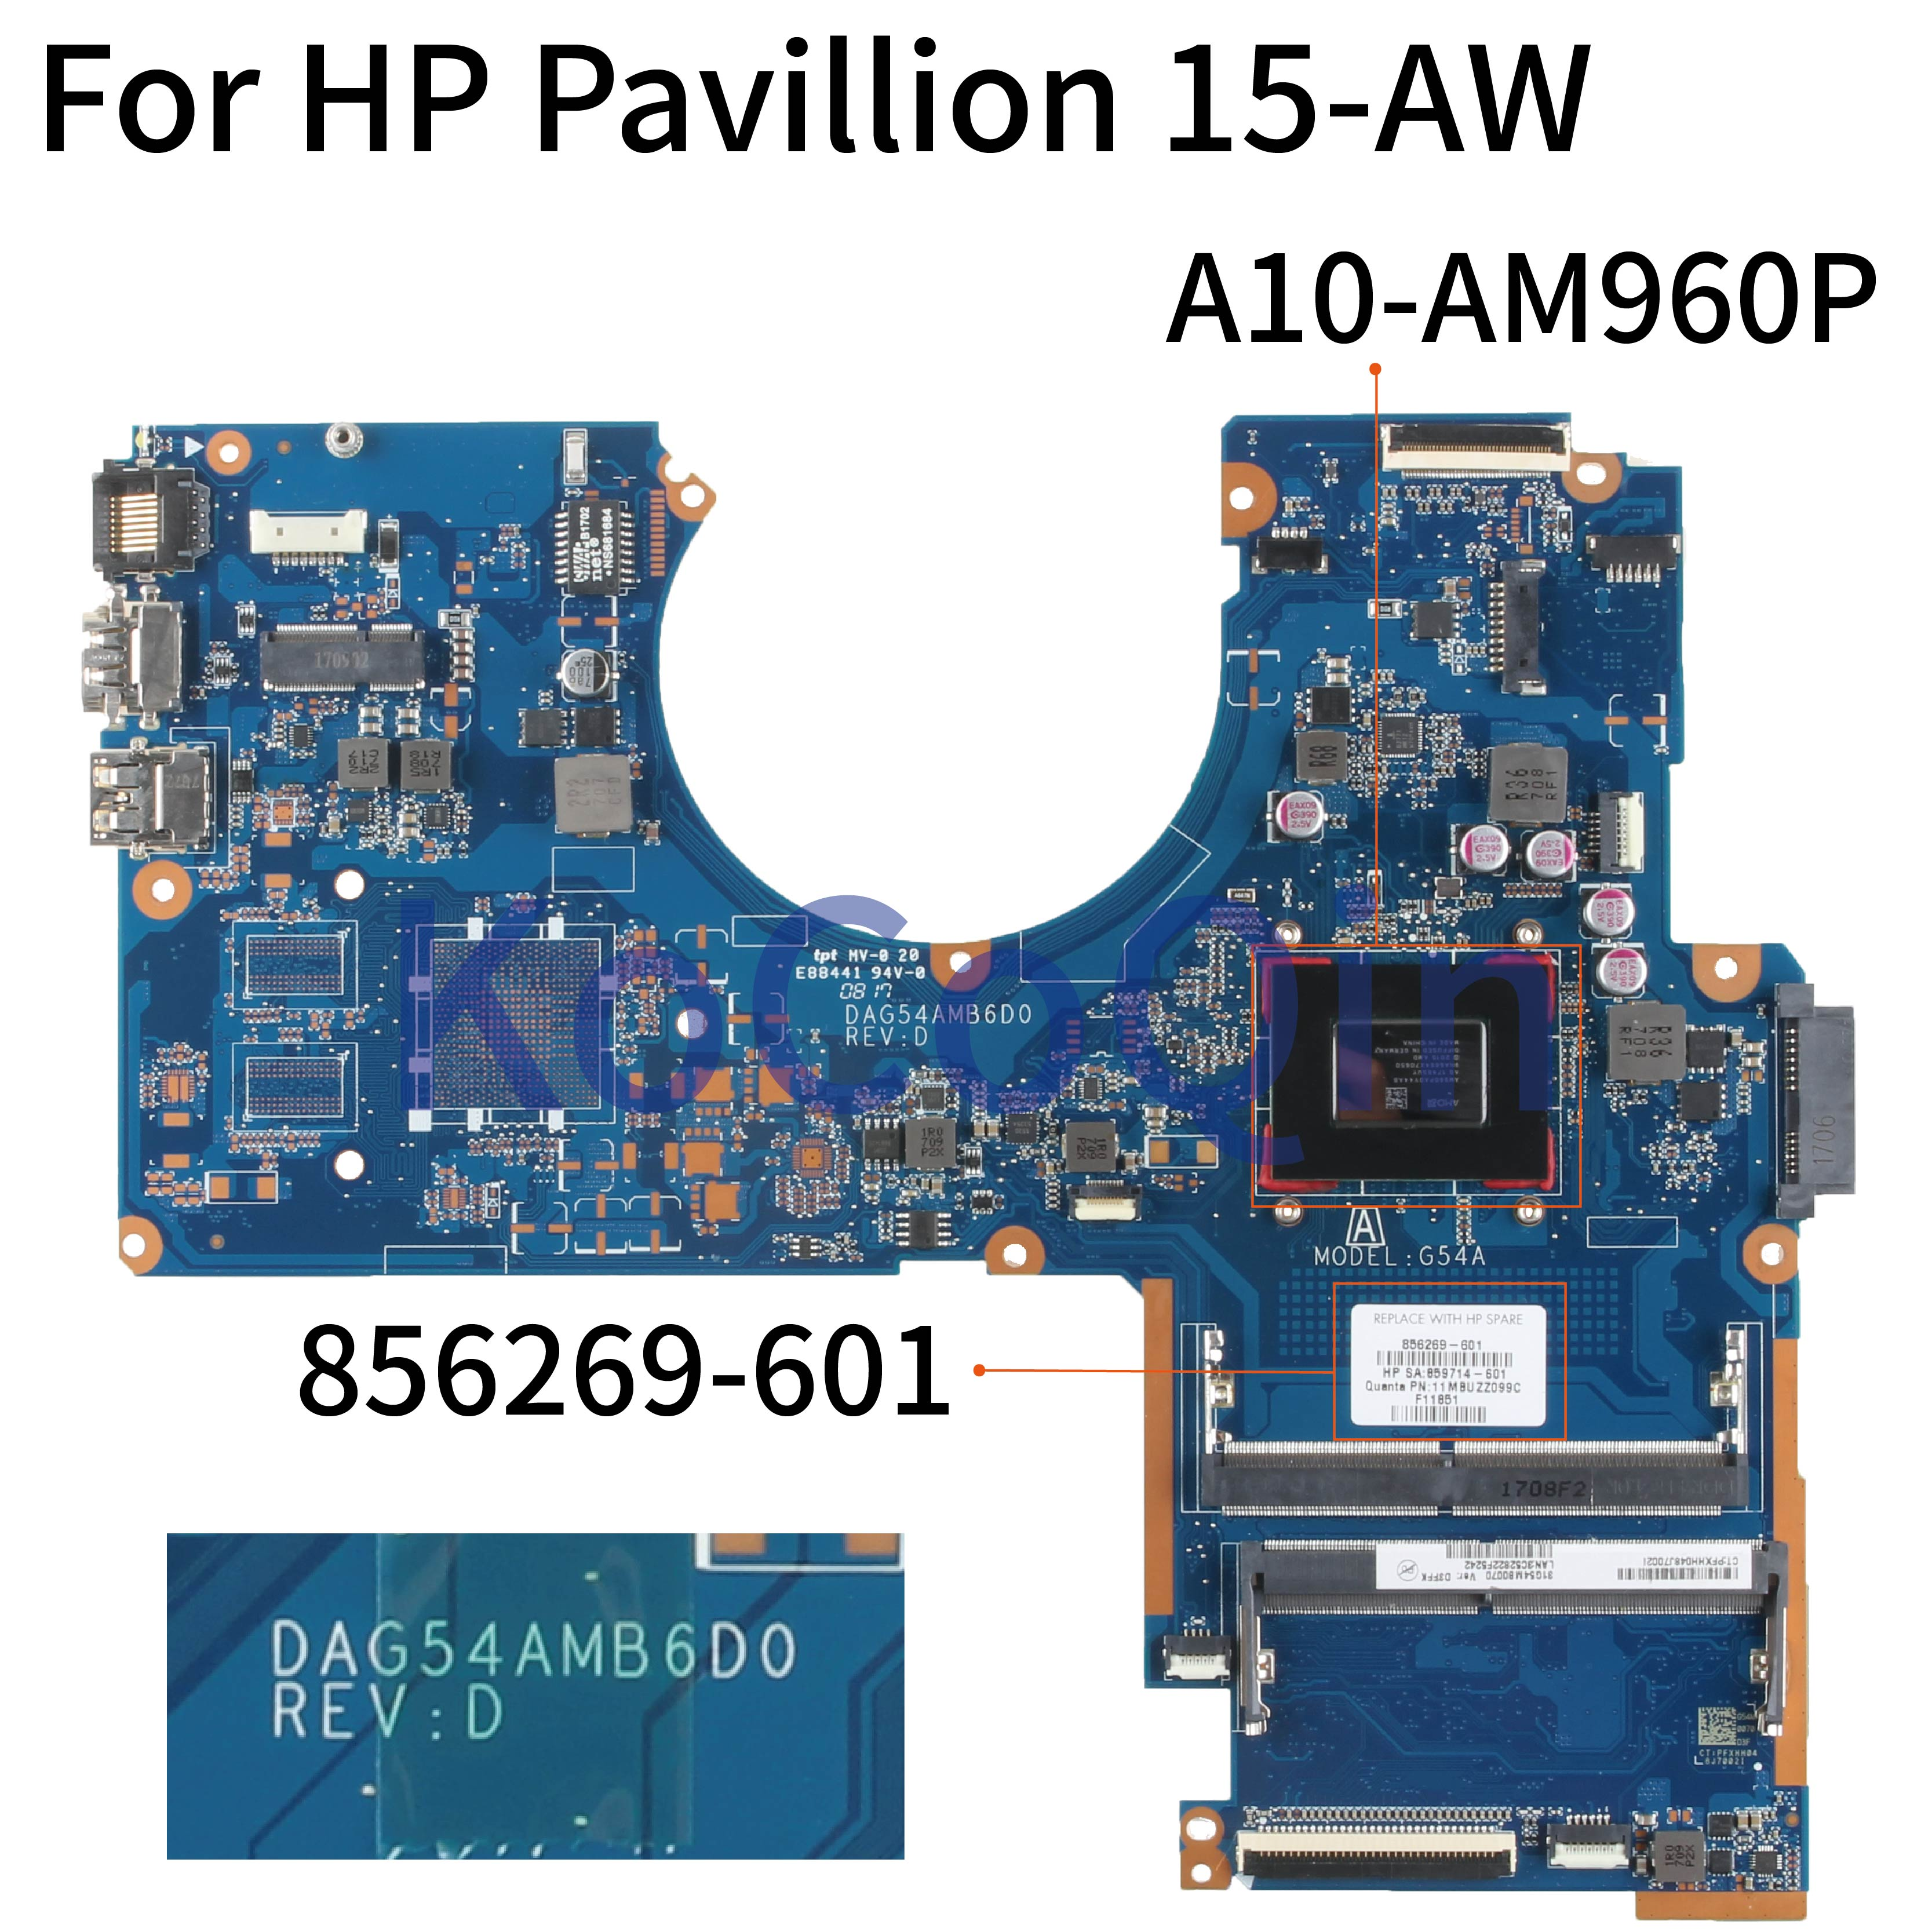 KoCoQin محمول لوحة رئيسية لأجهزة HP بافيليون 15-AW 15-AW053NR النواة A10-AM960P اللوحة 856269-001 856269-601 DAG54AMB6D0 DDR4